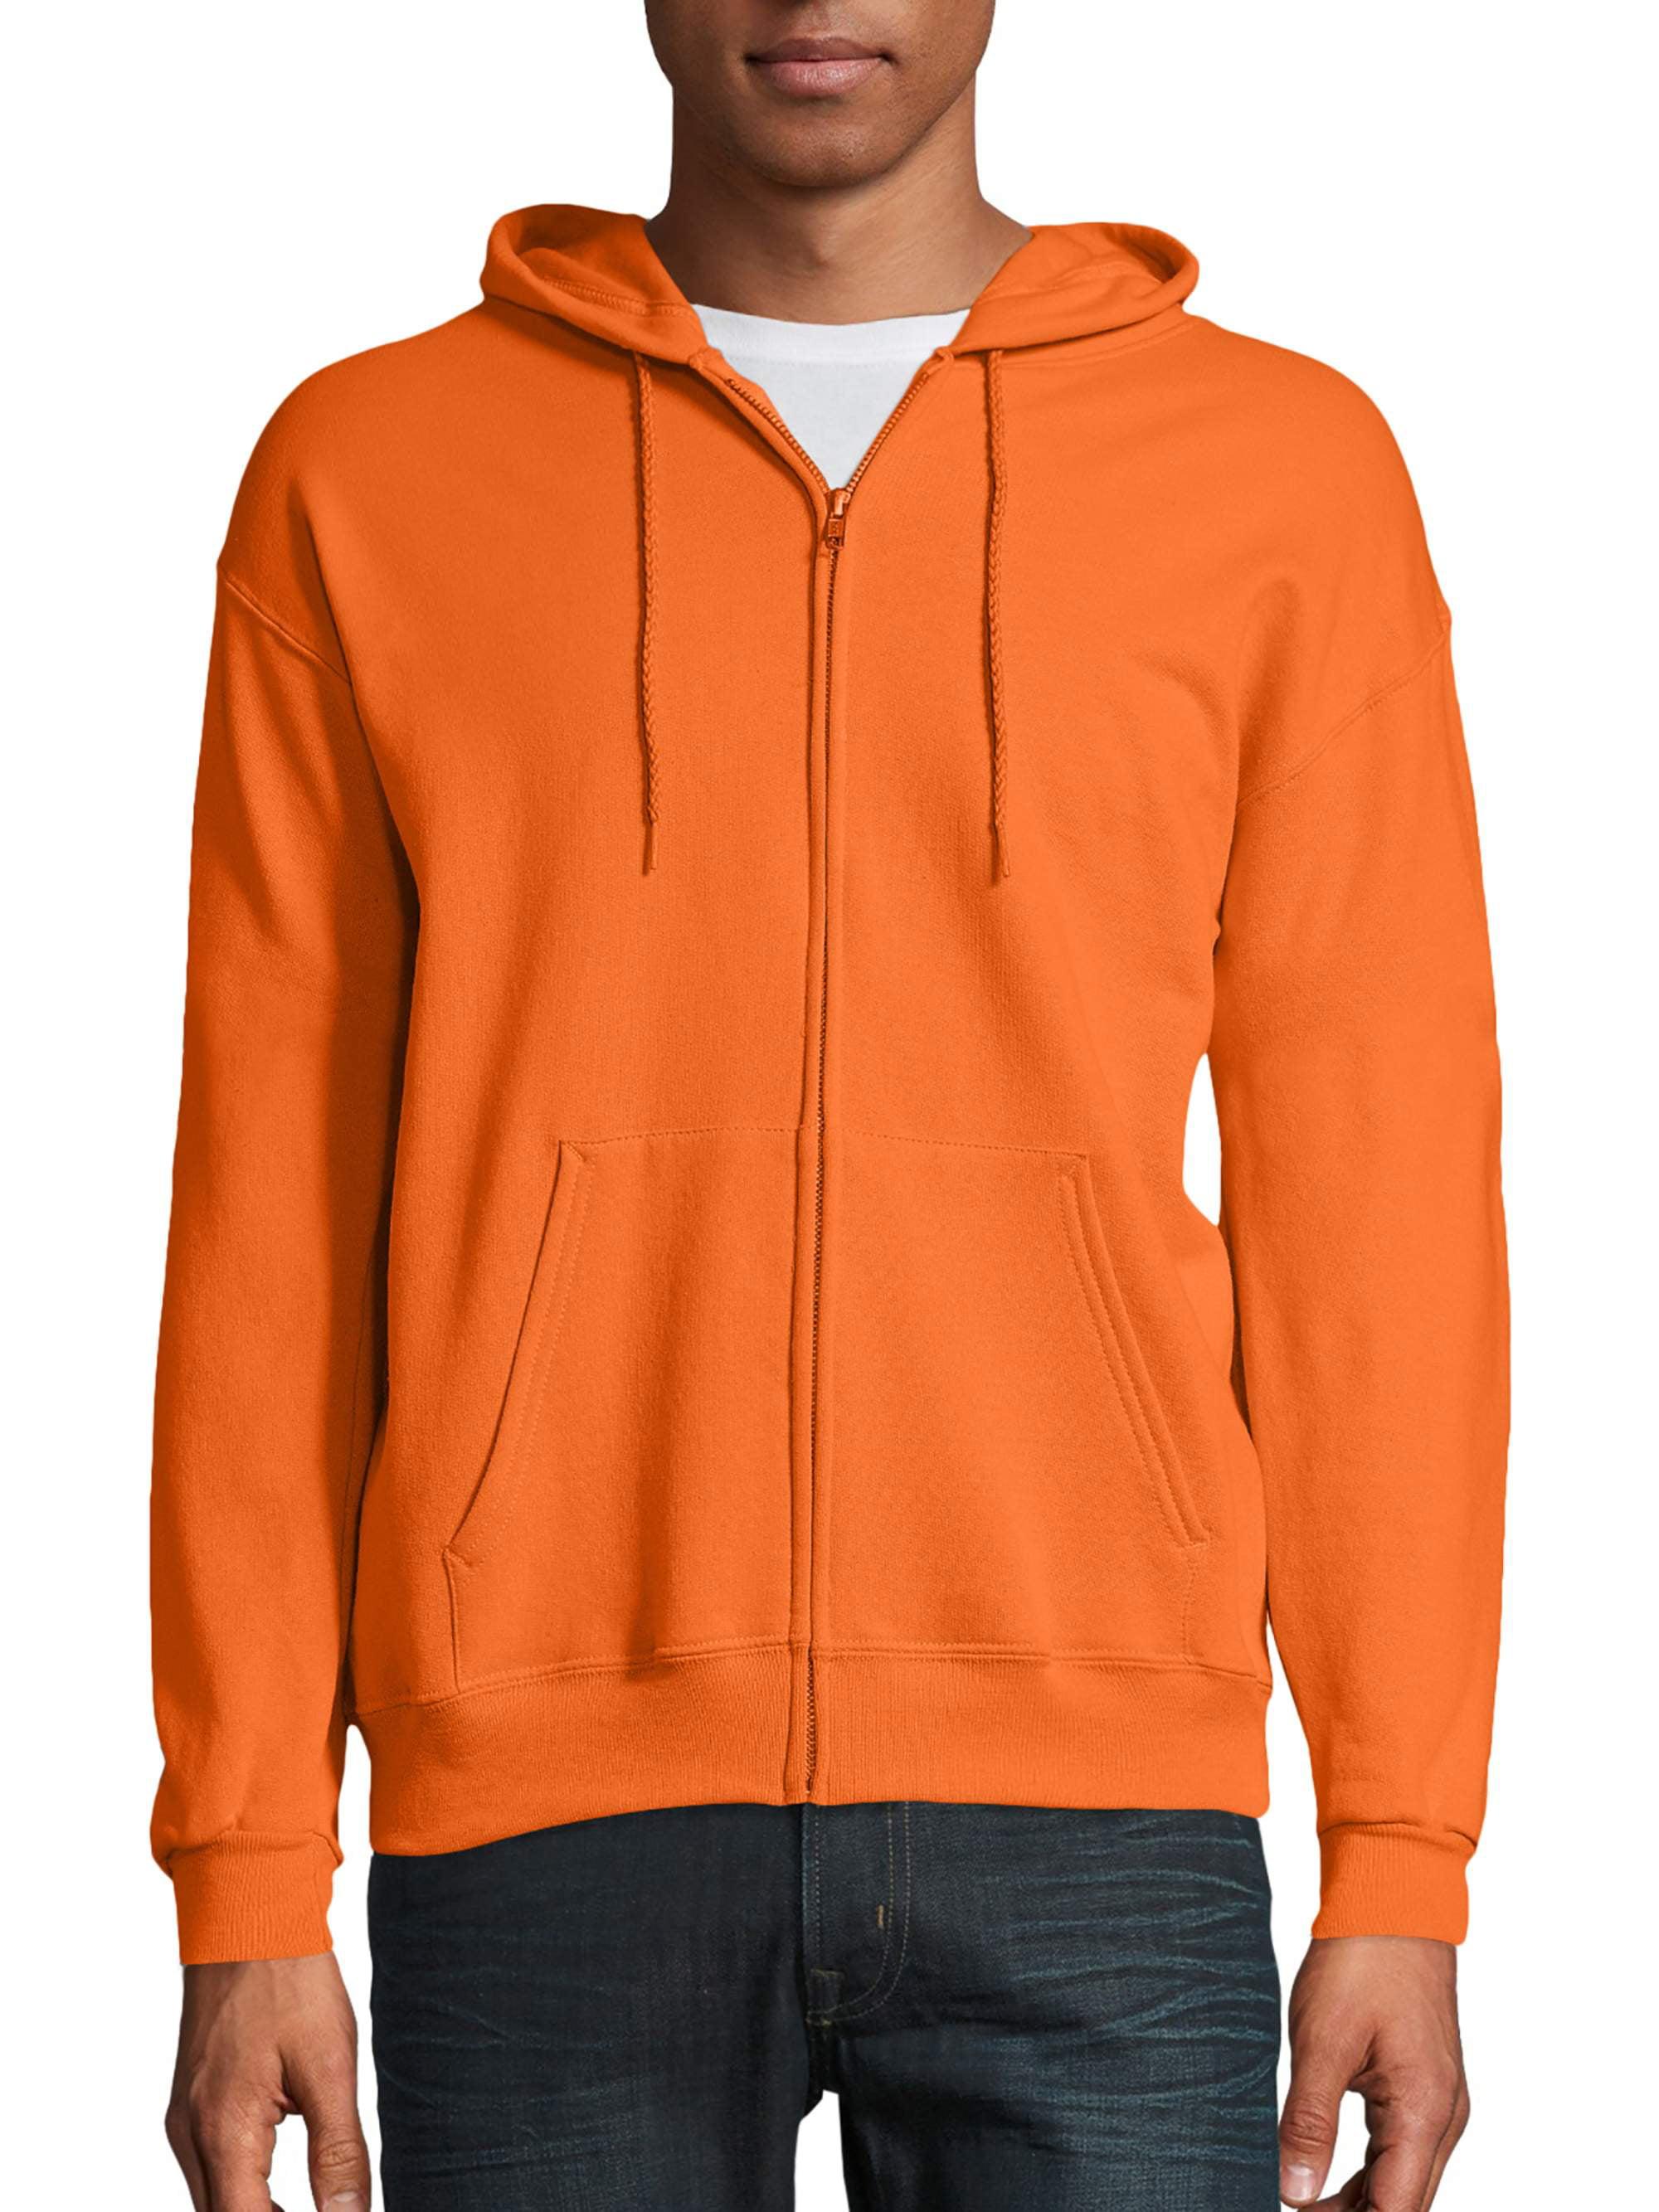 NEW Plain Neon Orange Sweatshirt Men Women Pullover Hoodie Cotton Blank Gildan